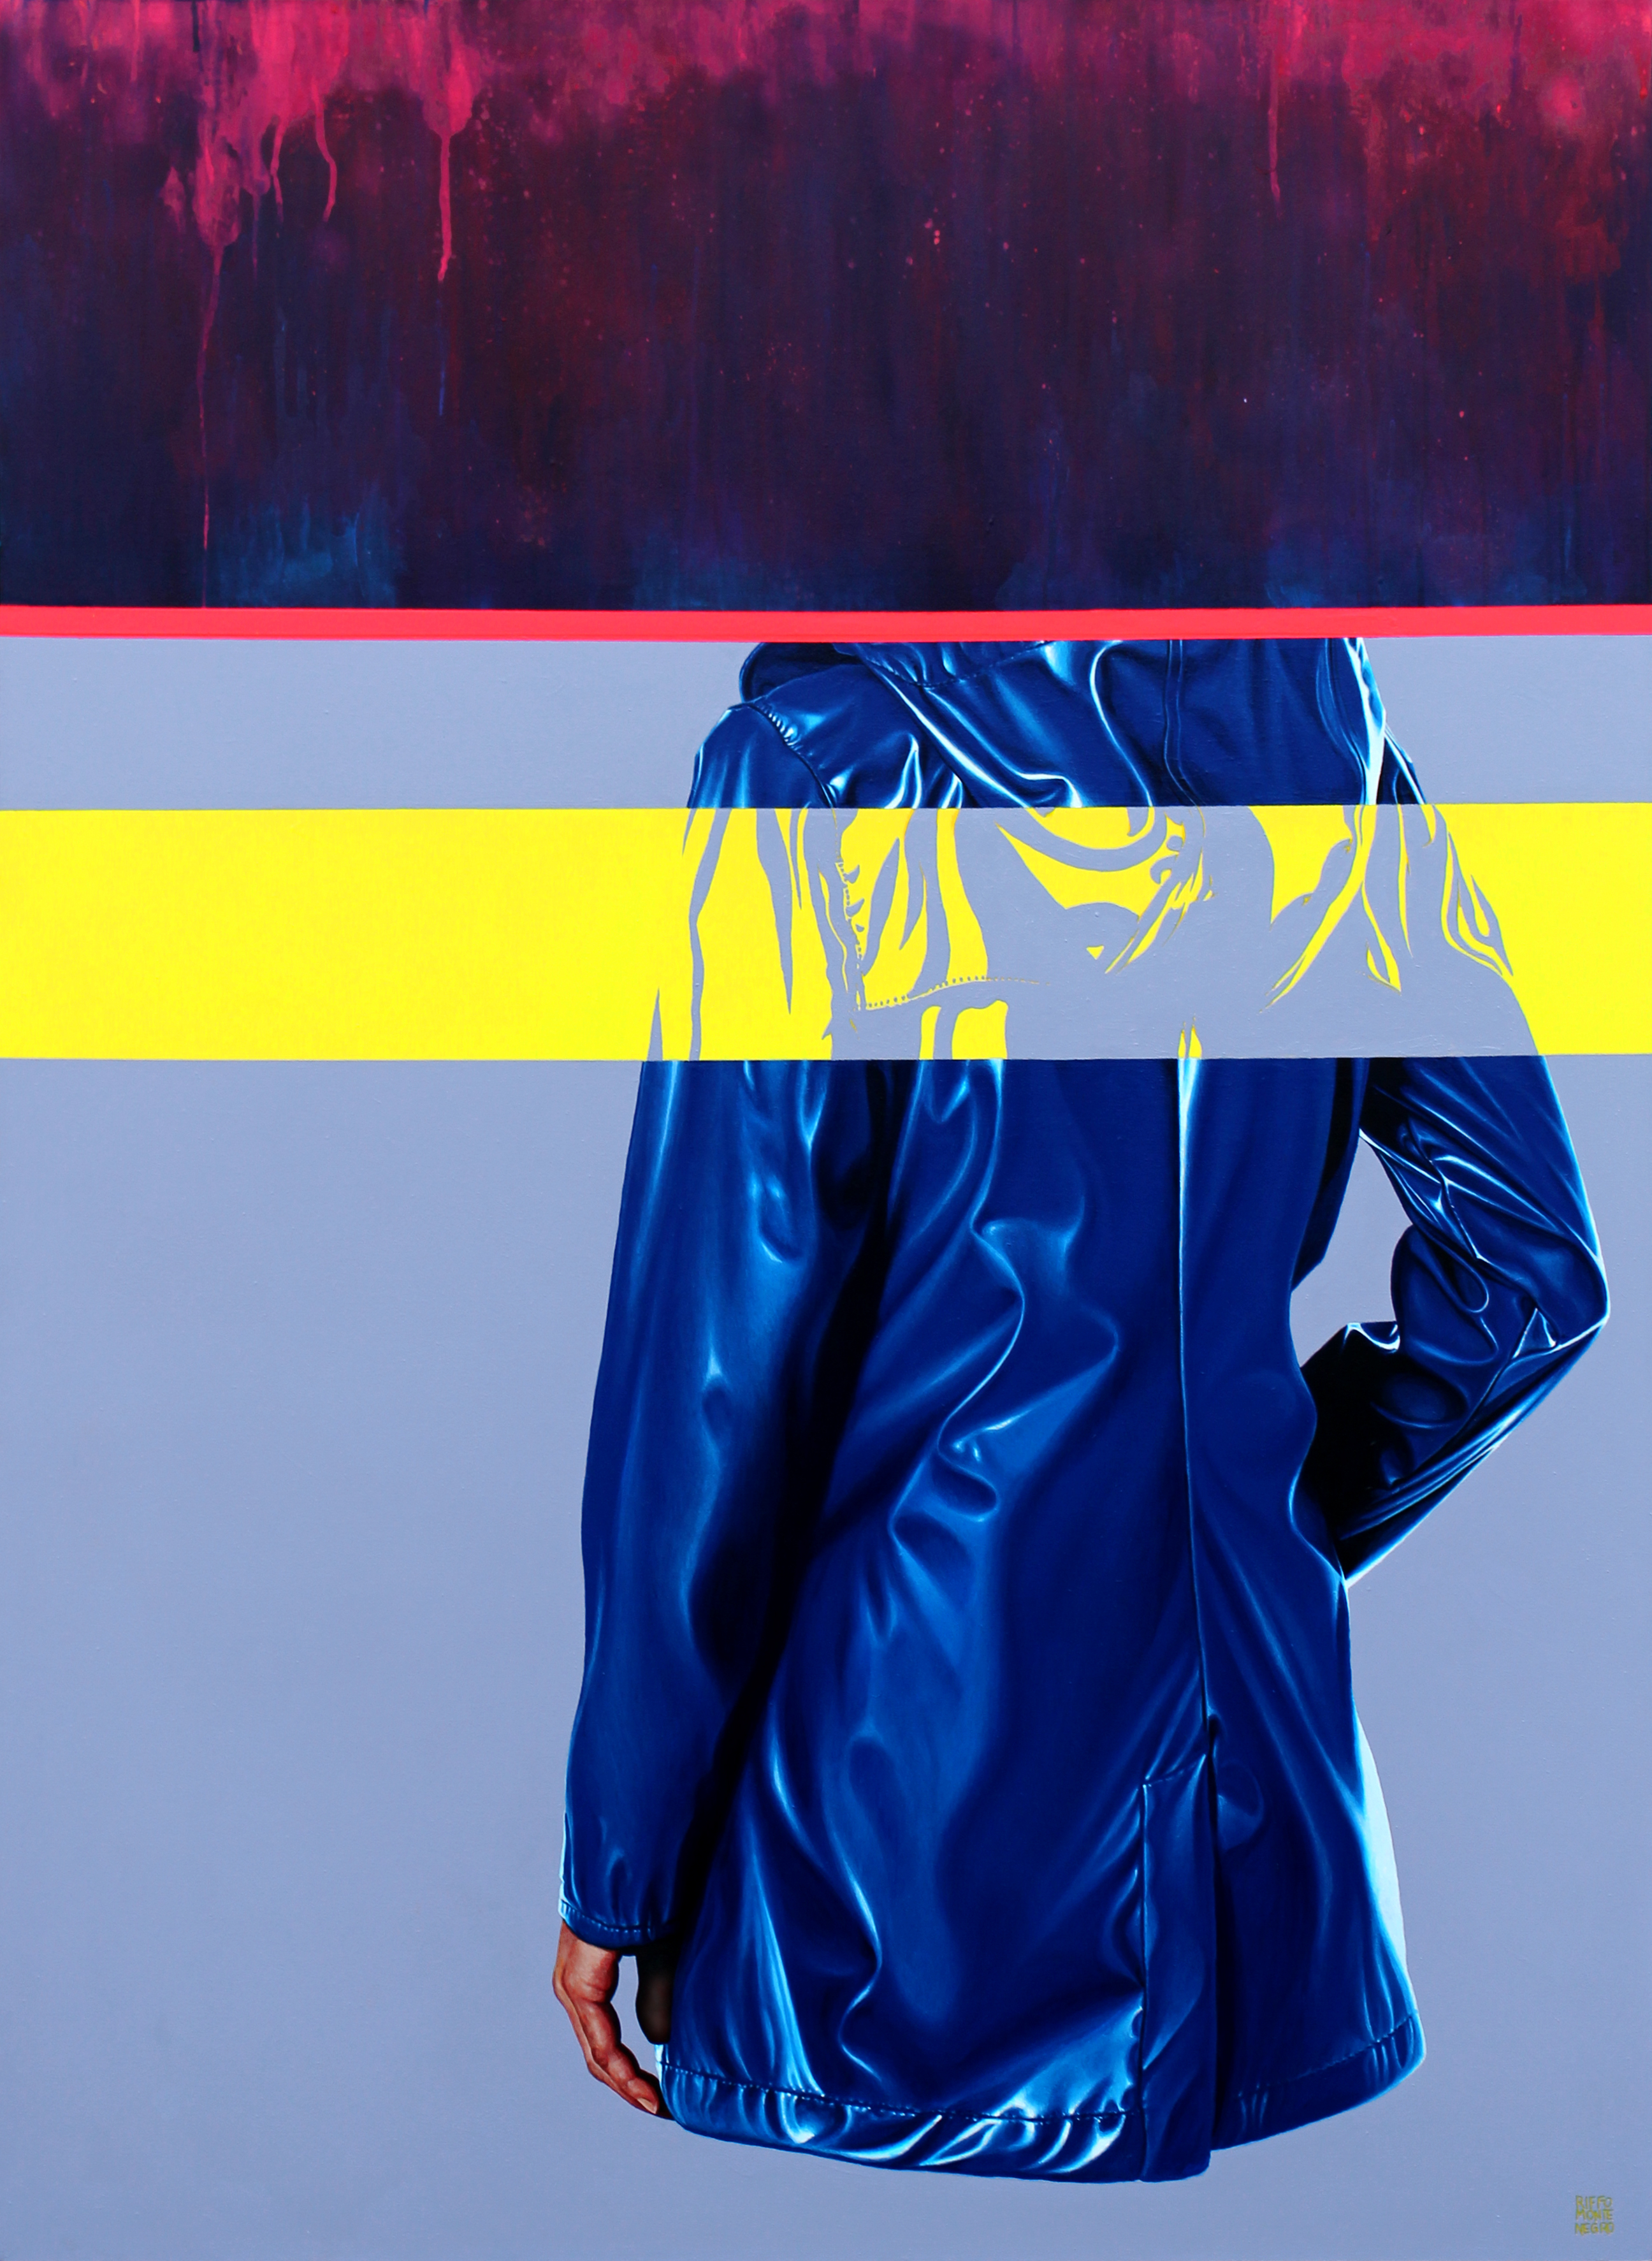 srm-untitled-raincoat14--150x110cm-oct-2019